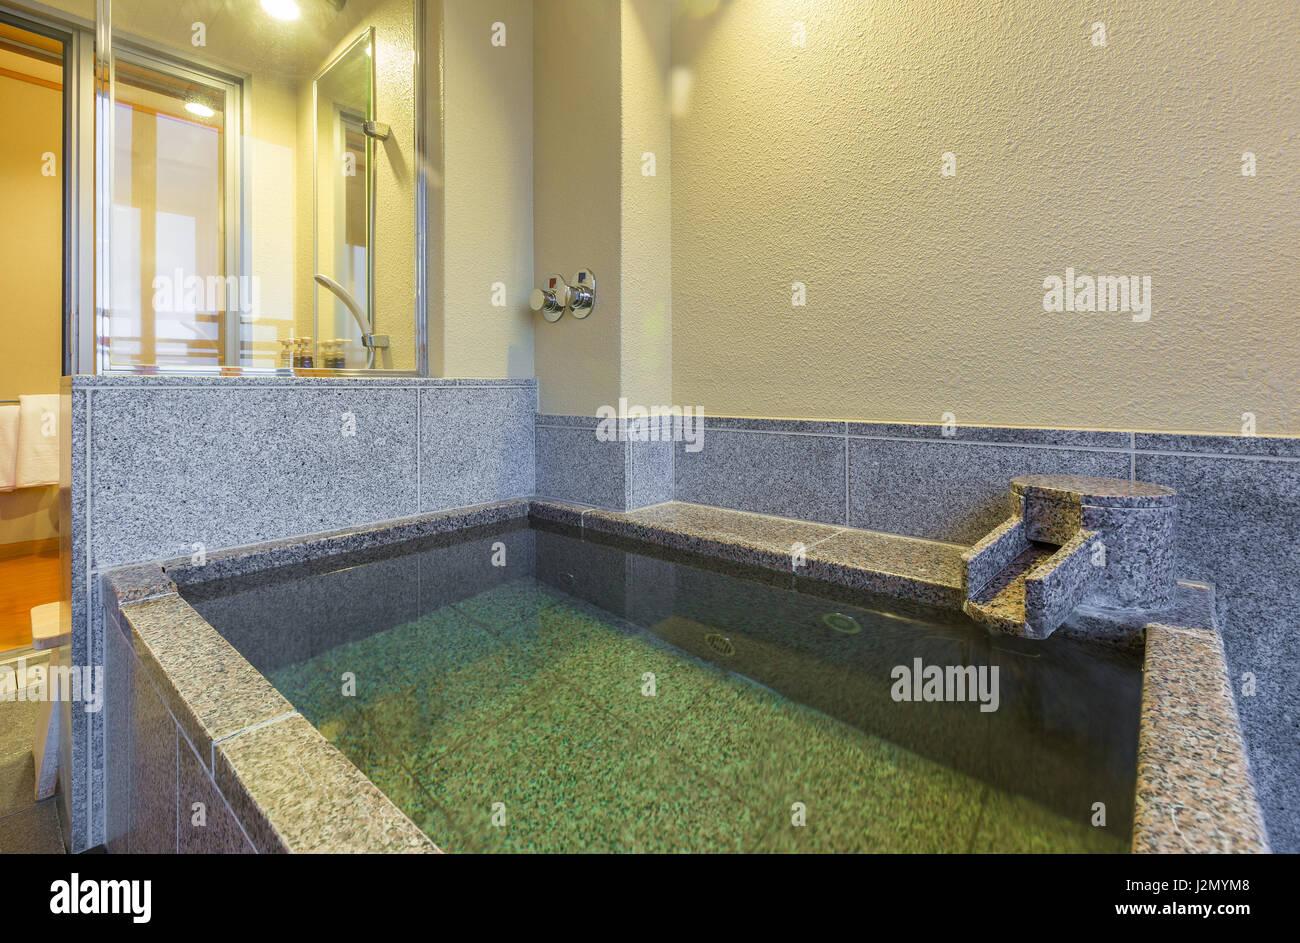 Vasca Da Bagno Stile Giapponese : Onsen privato vasca da bagno in stile giapponese vasca da bagno